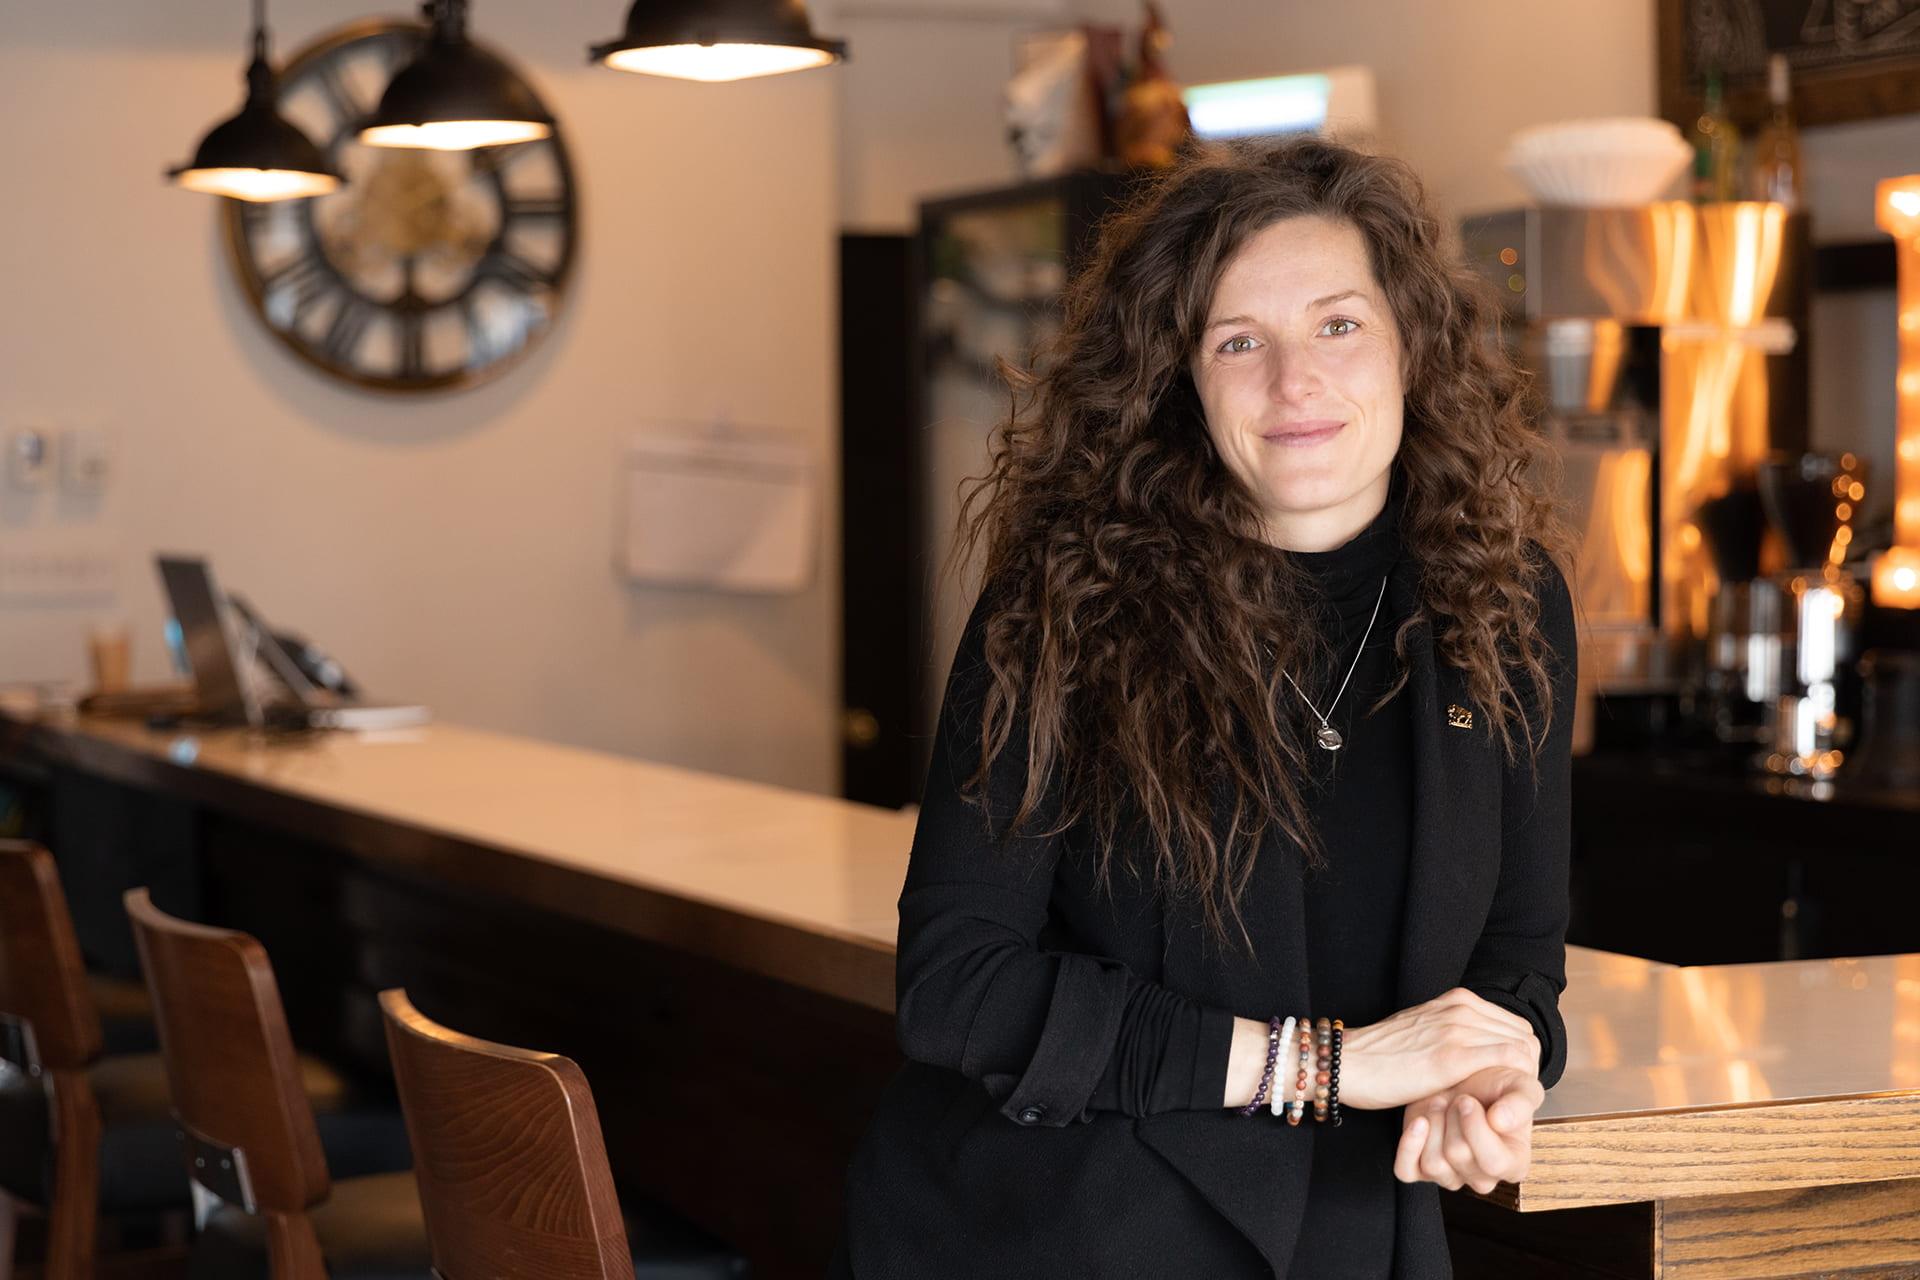 RRC grad Laneil Smith at her restaurant Marion Street Eatery